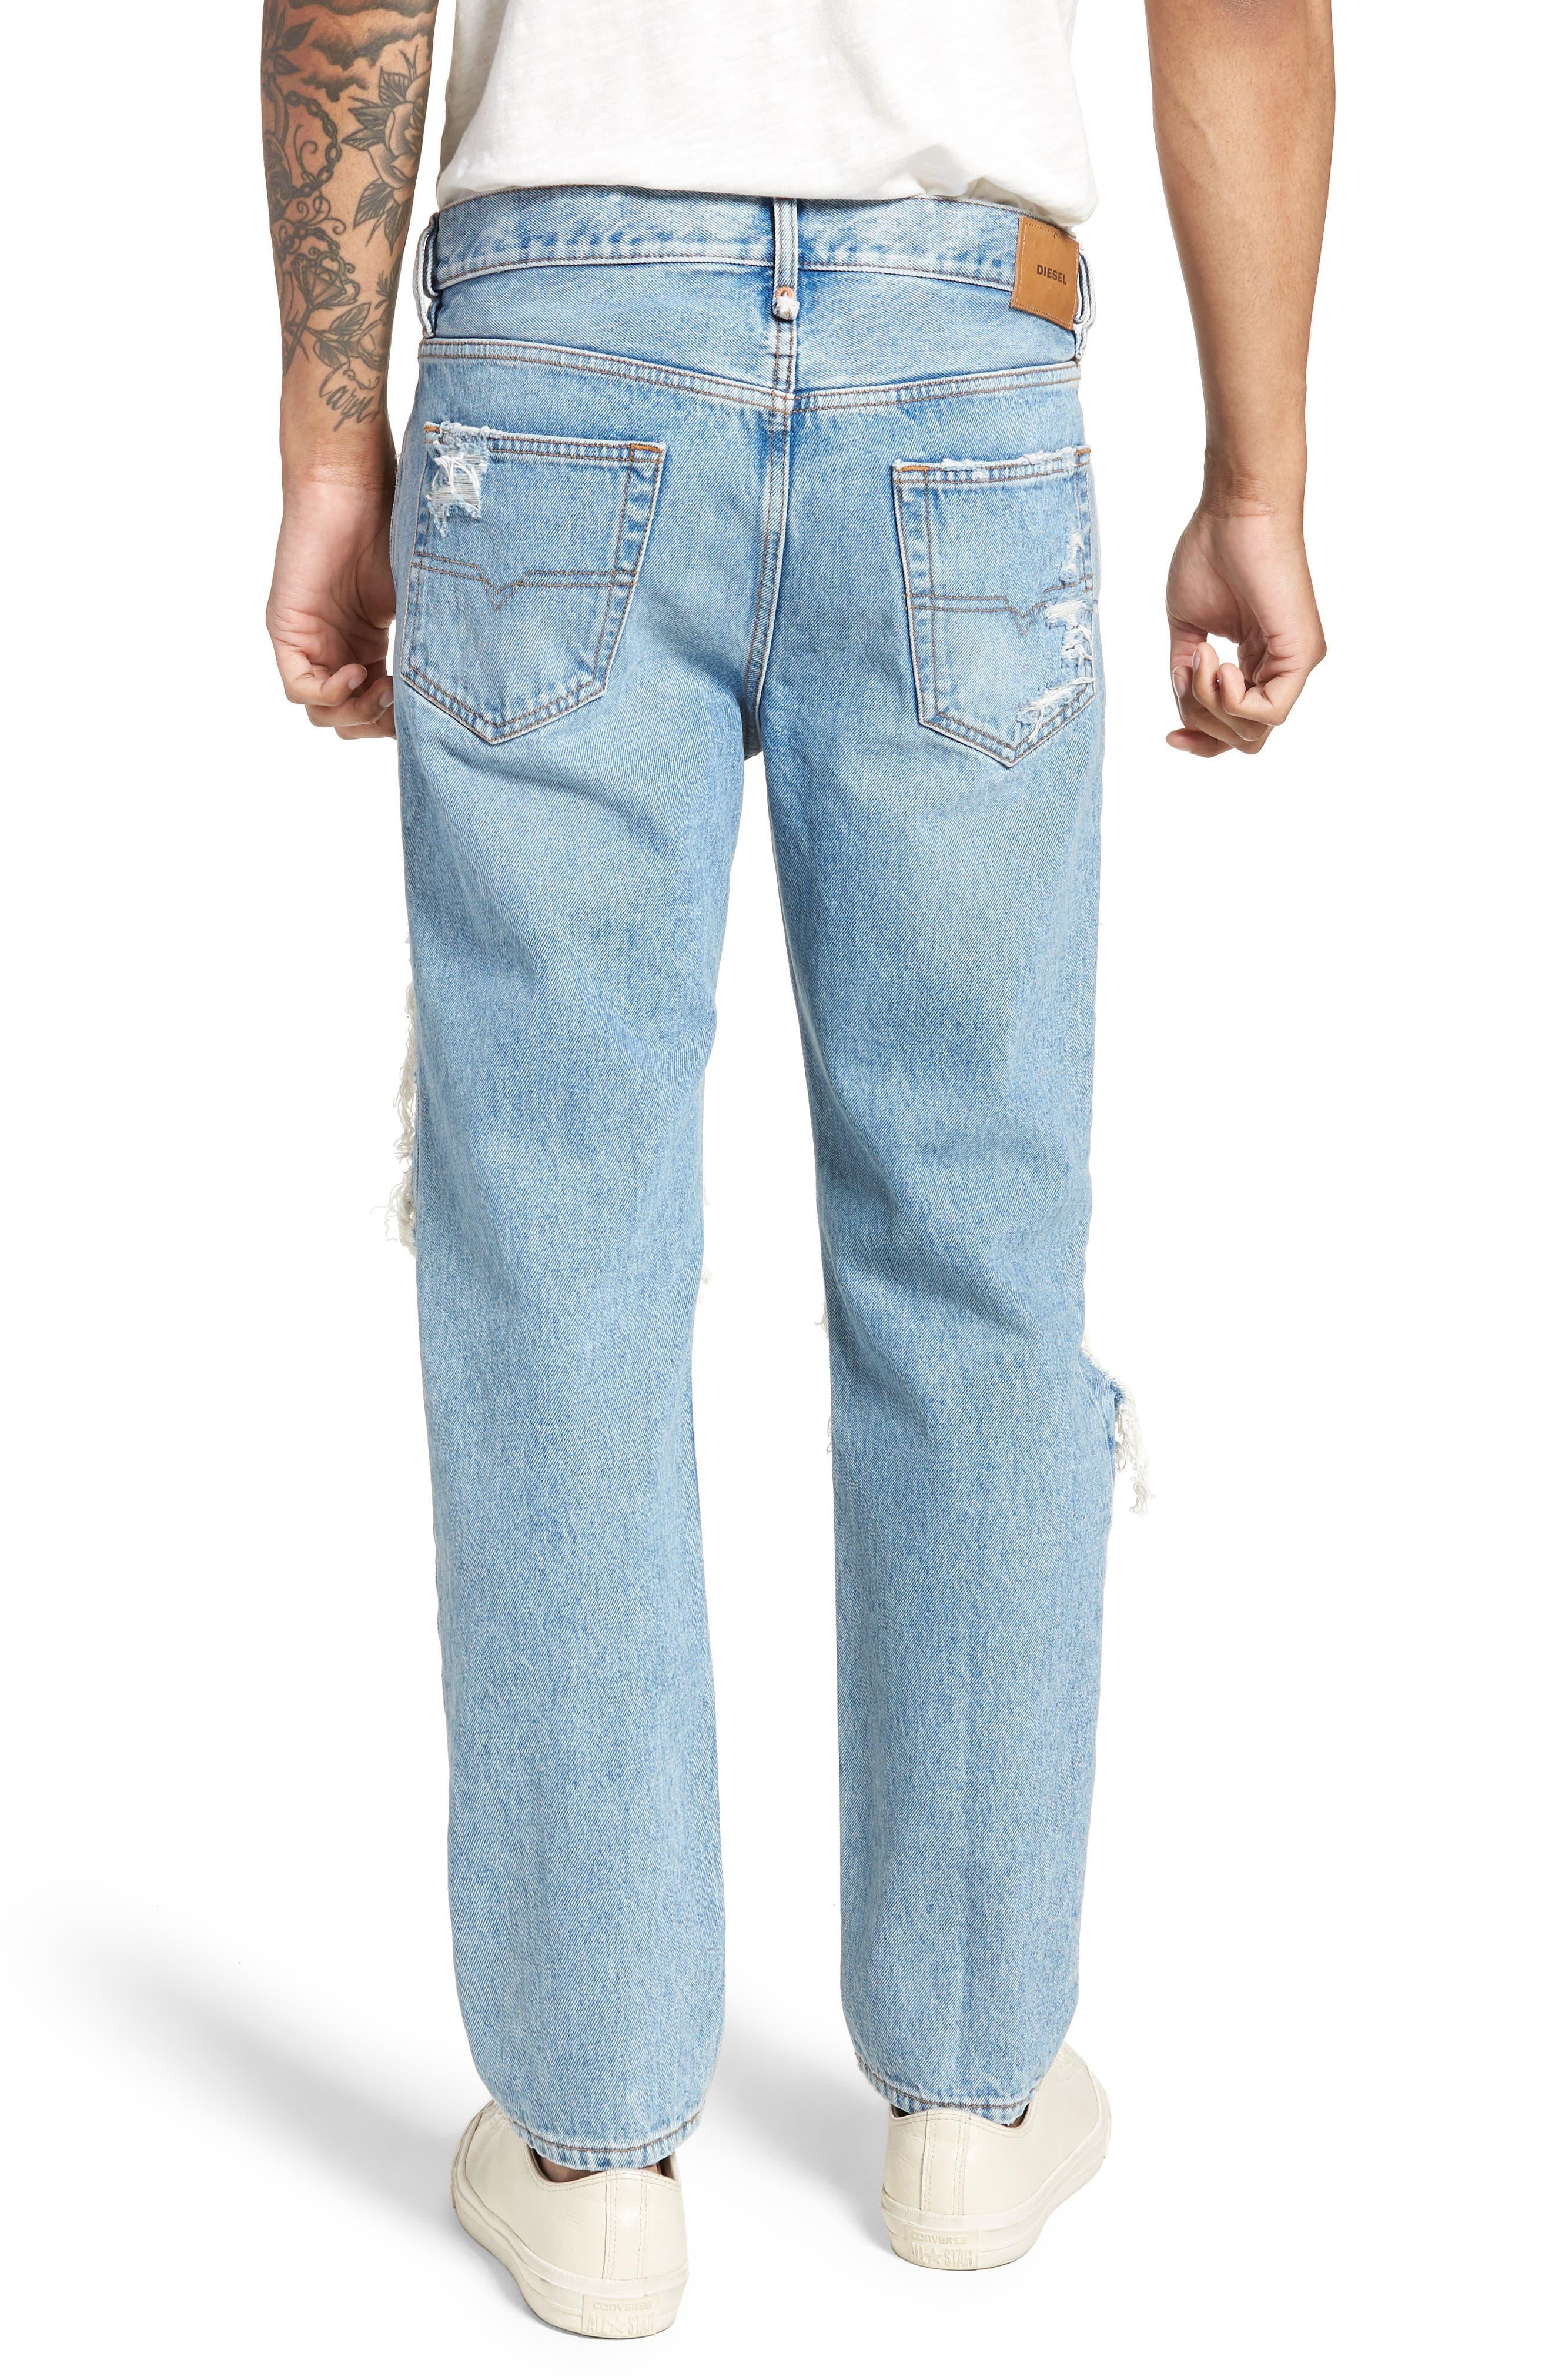 Mharky Slim Straight Leg Jeans,                             Alternate thumbnail 2, color,                             0076M